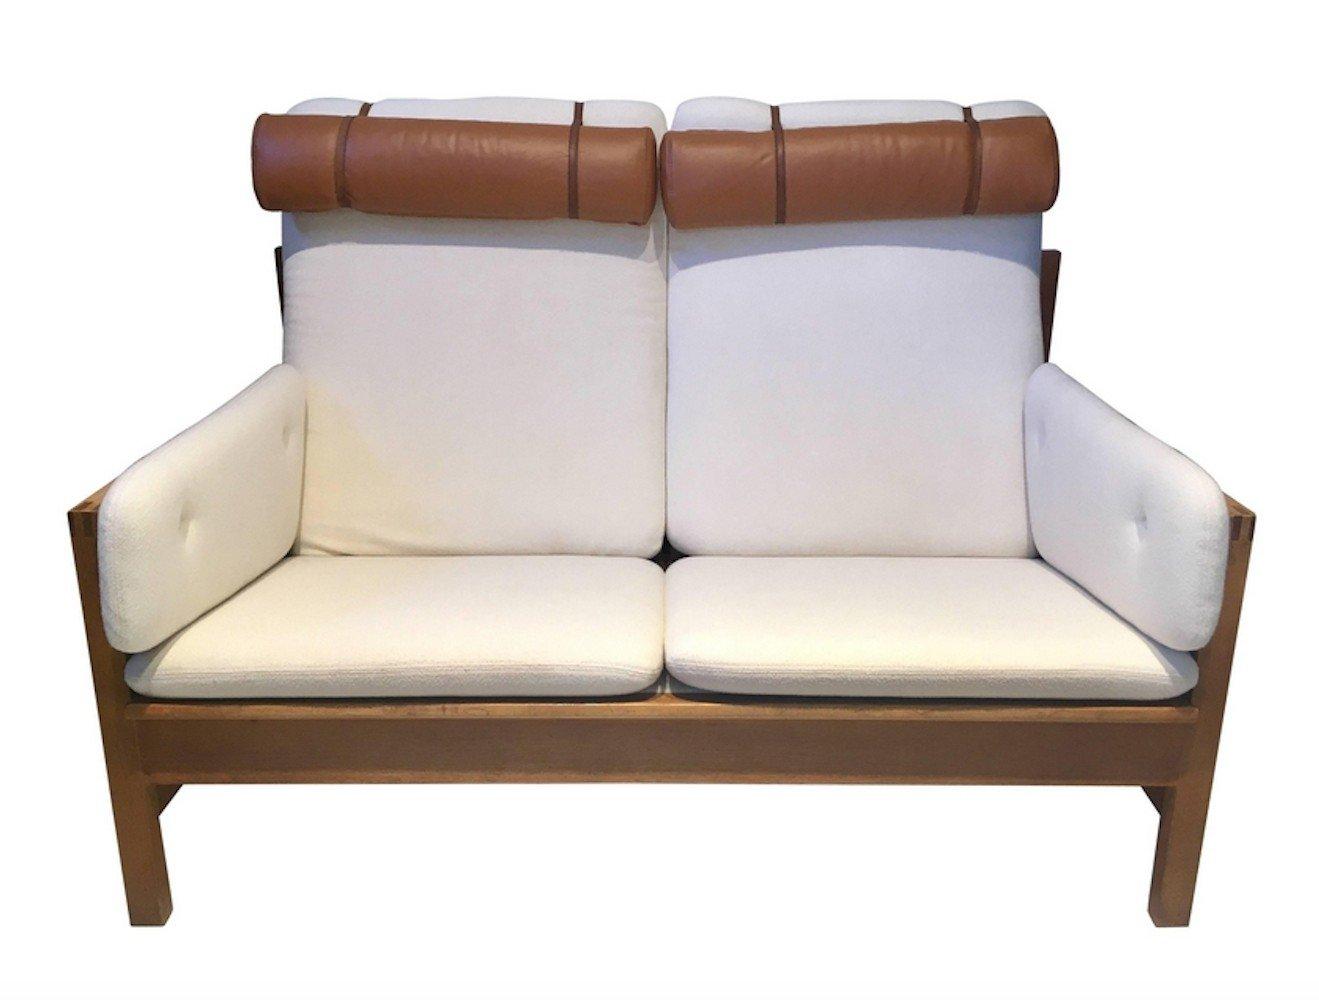 borge mogensen sofa model 2209 harper urban barn børge leather fredericia